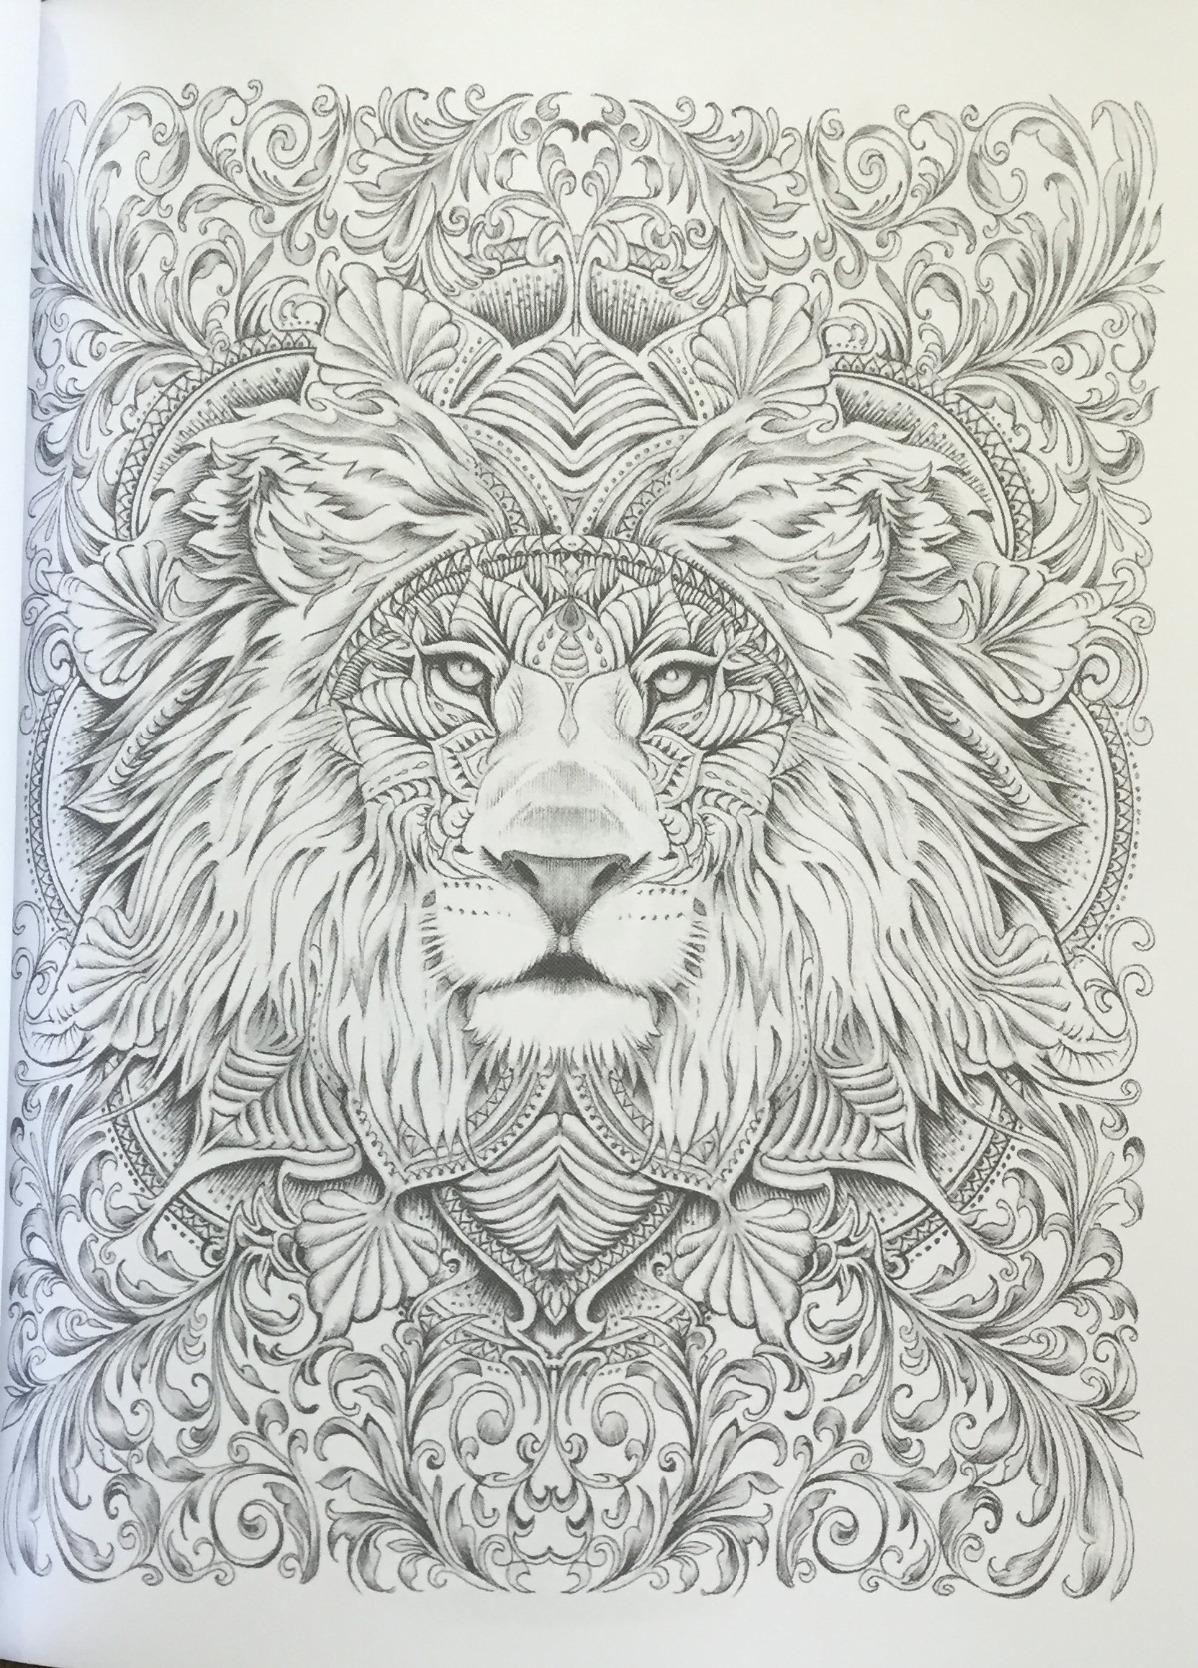 Colour my sketchbook 3 greyscale colouring book volume 1 bennett klein